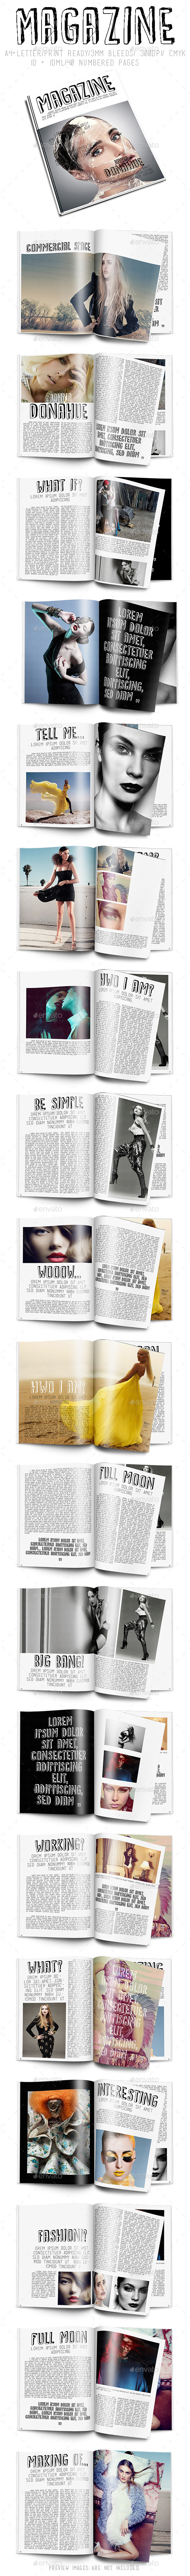 Style Magazine  - Magazines Print Templates